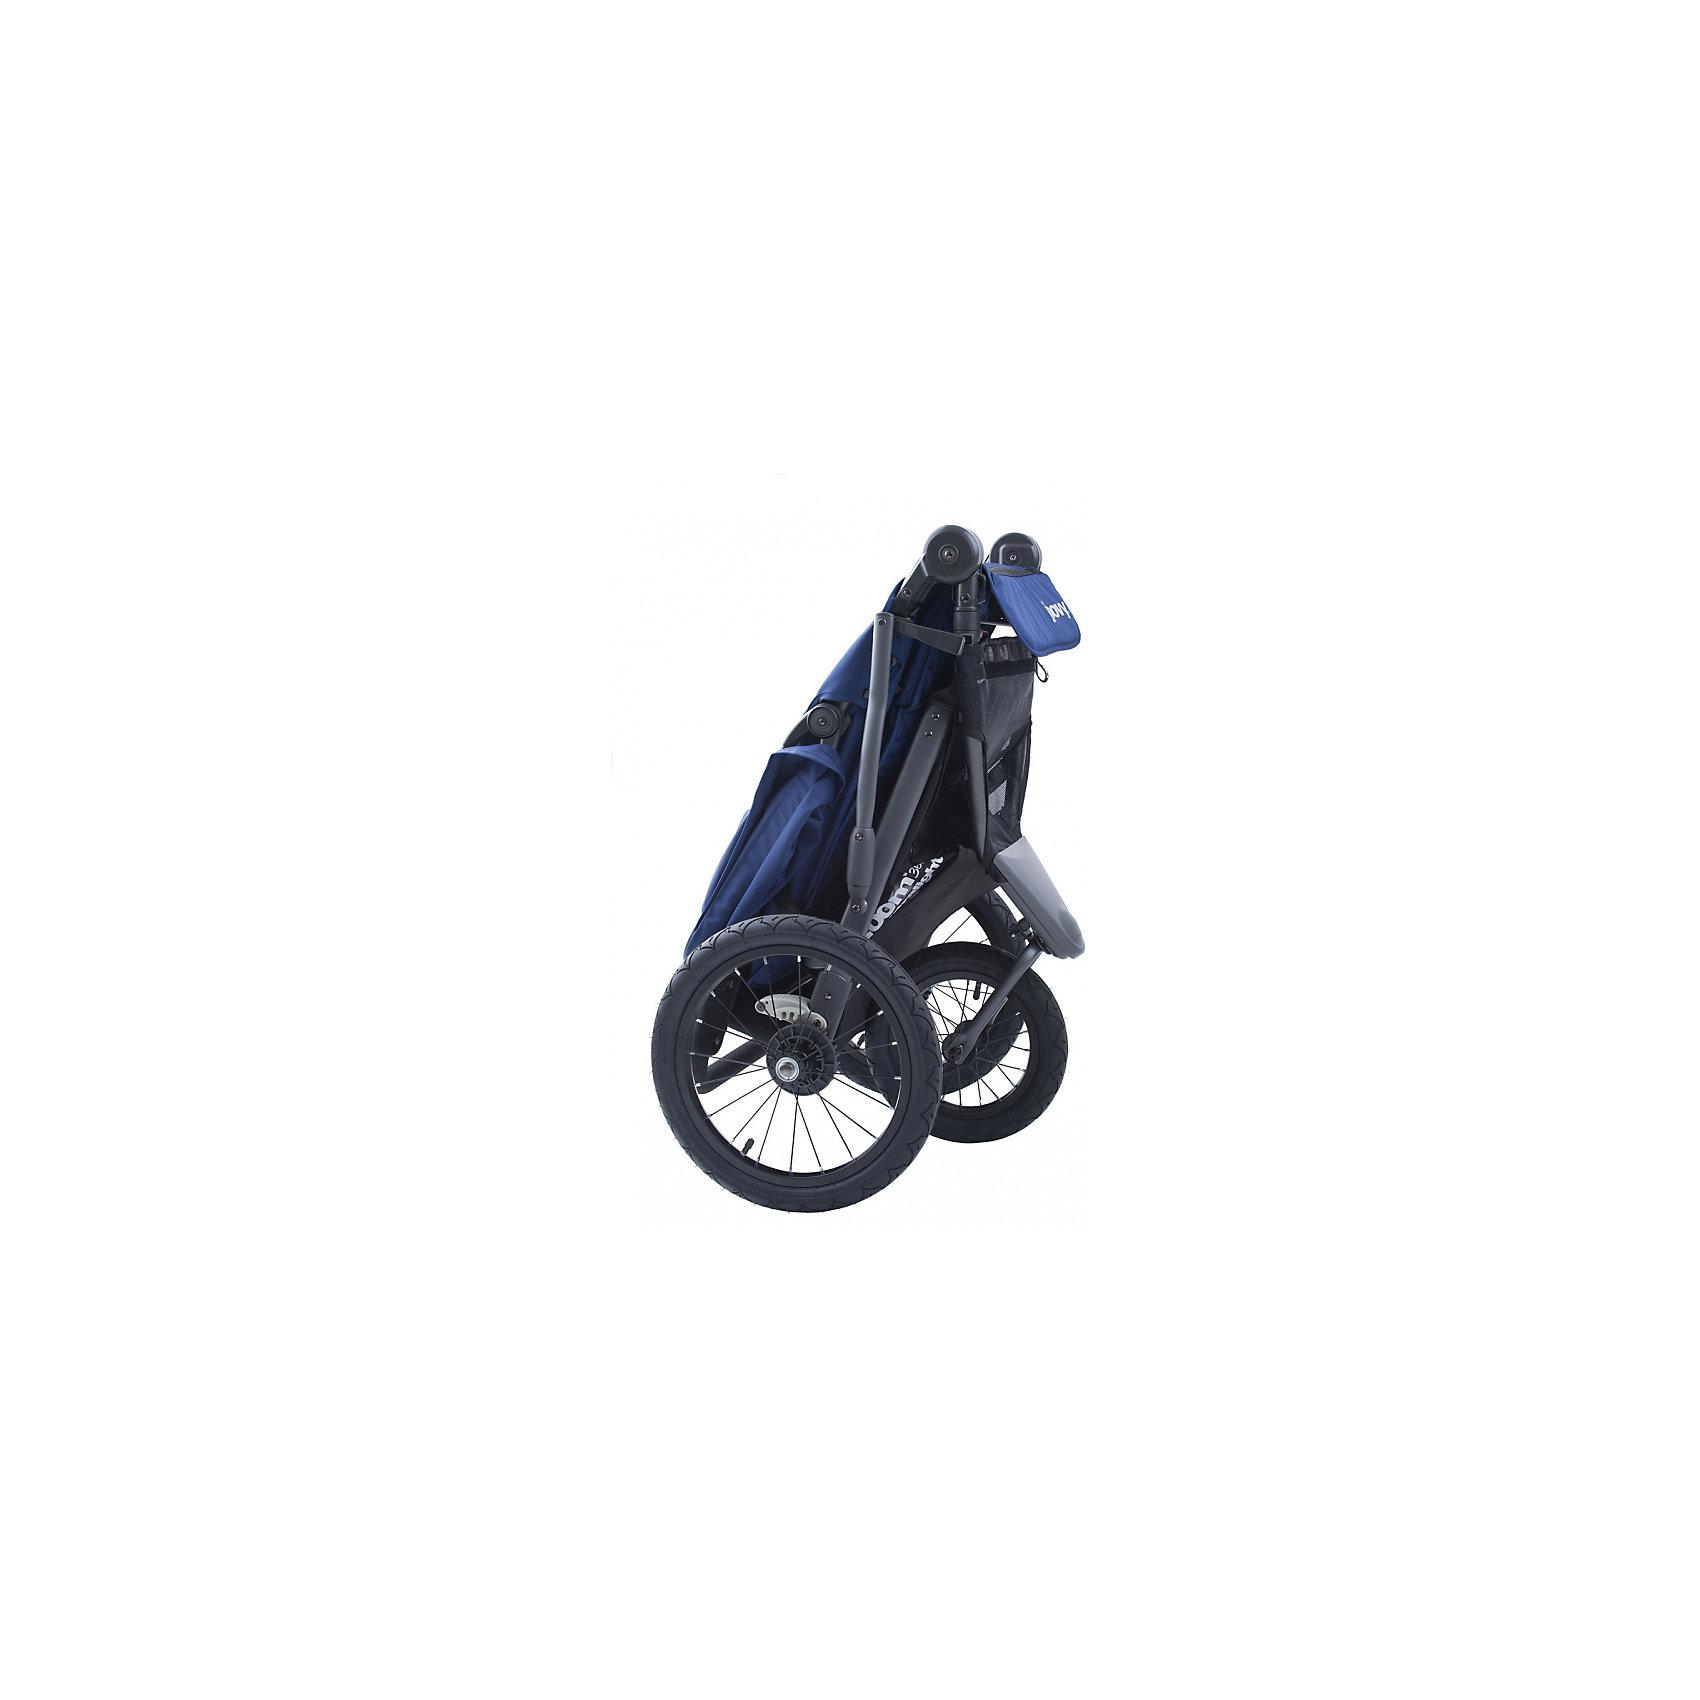 Прогулочная коляска Joovy Zoom 360 Ultralight, красный